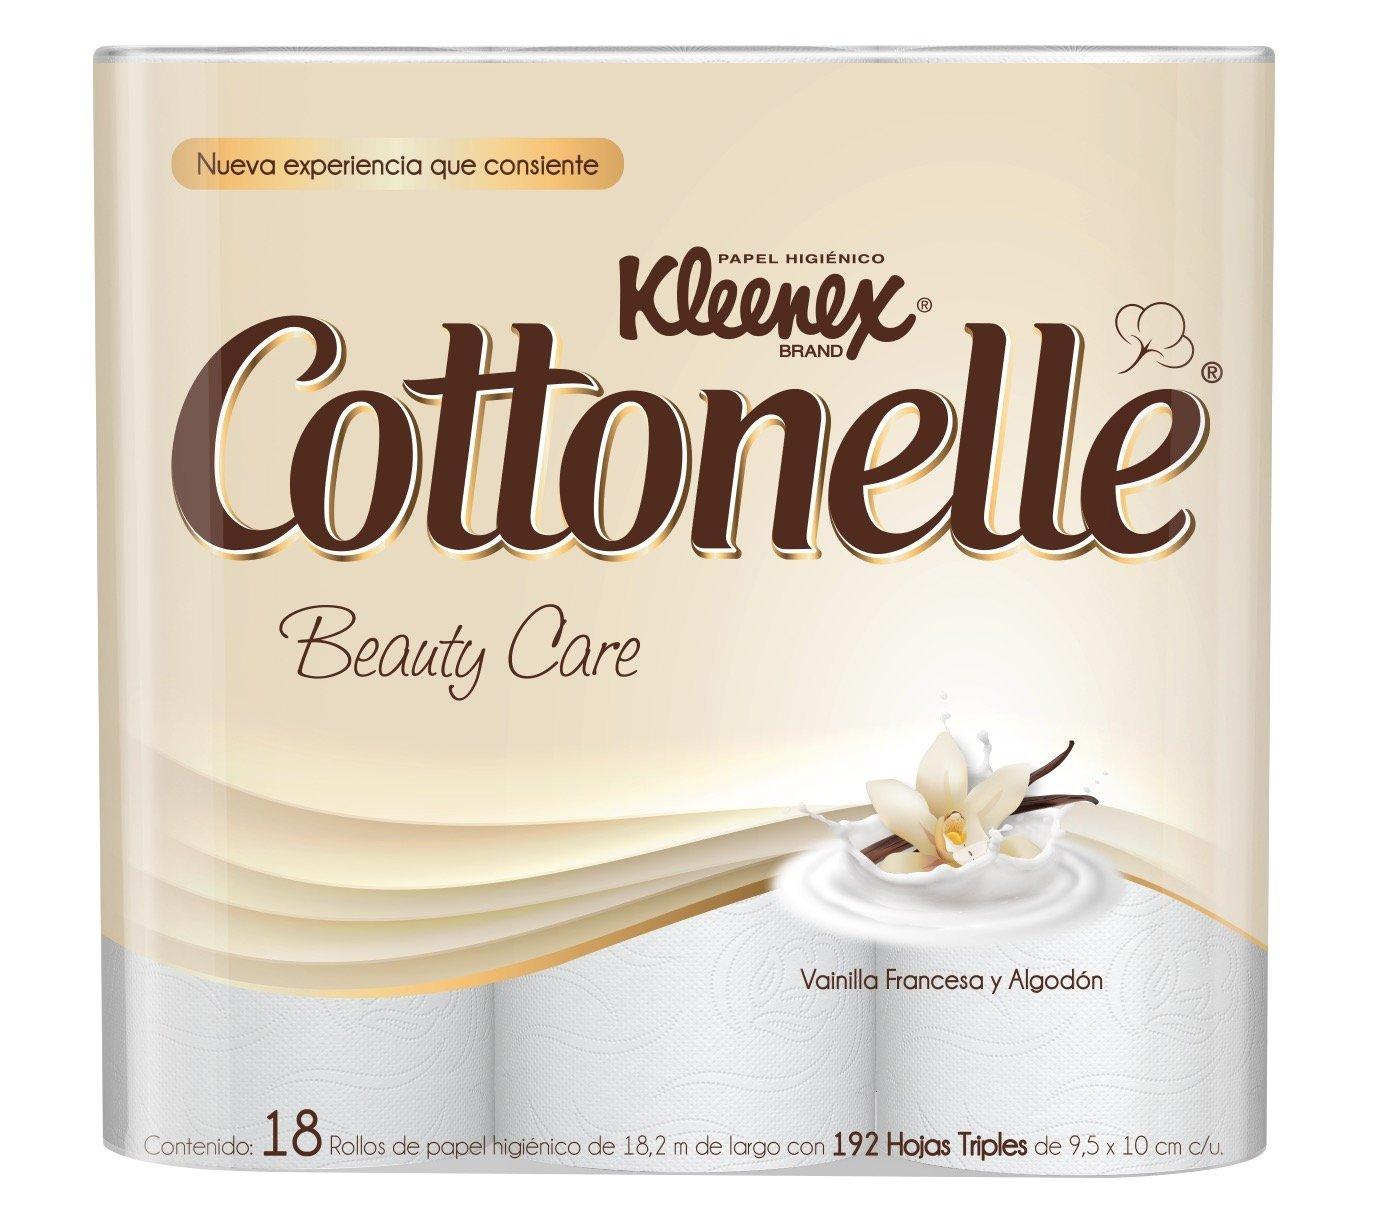 Amazon: Kleenex Cottonelle Beauty Care 18 Rollos